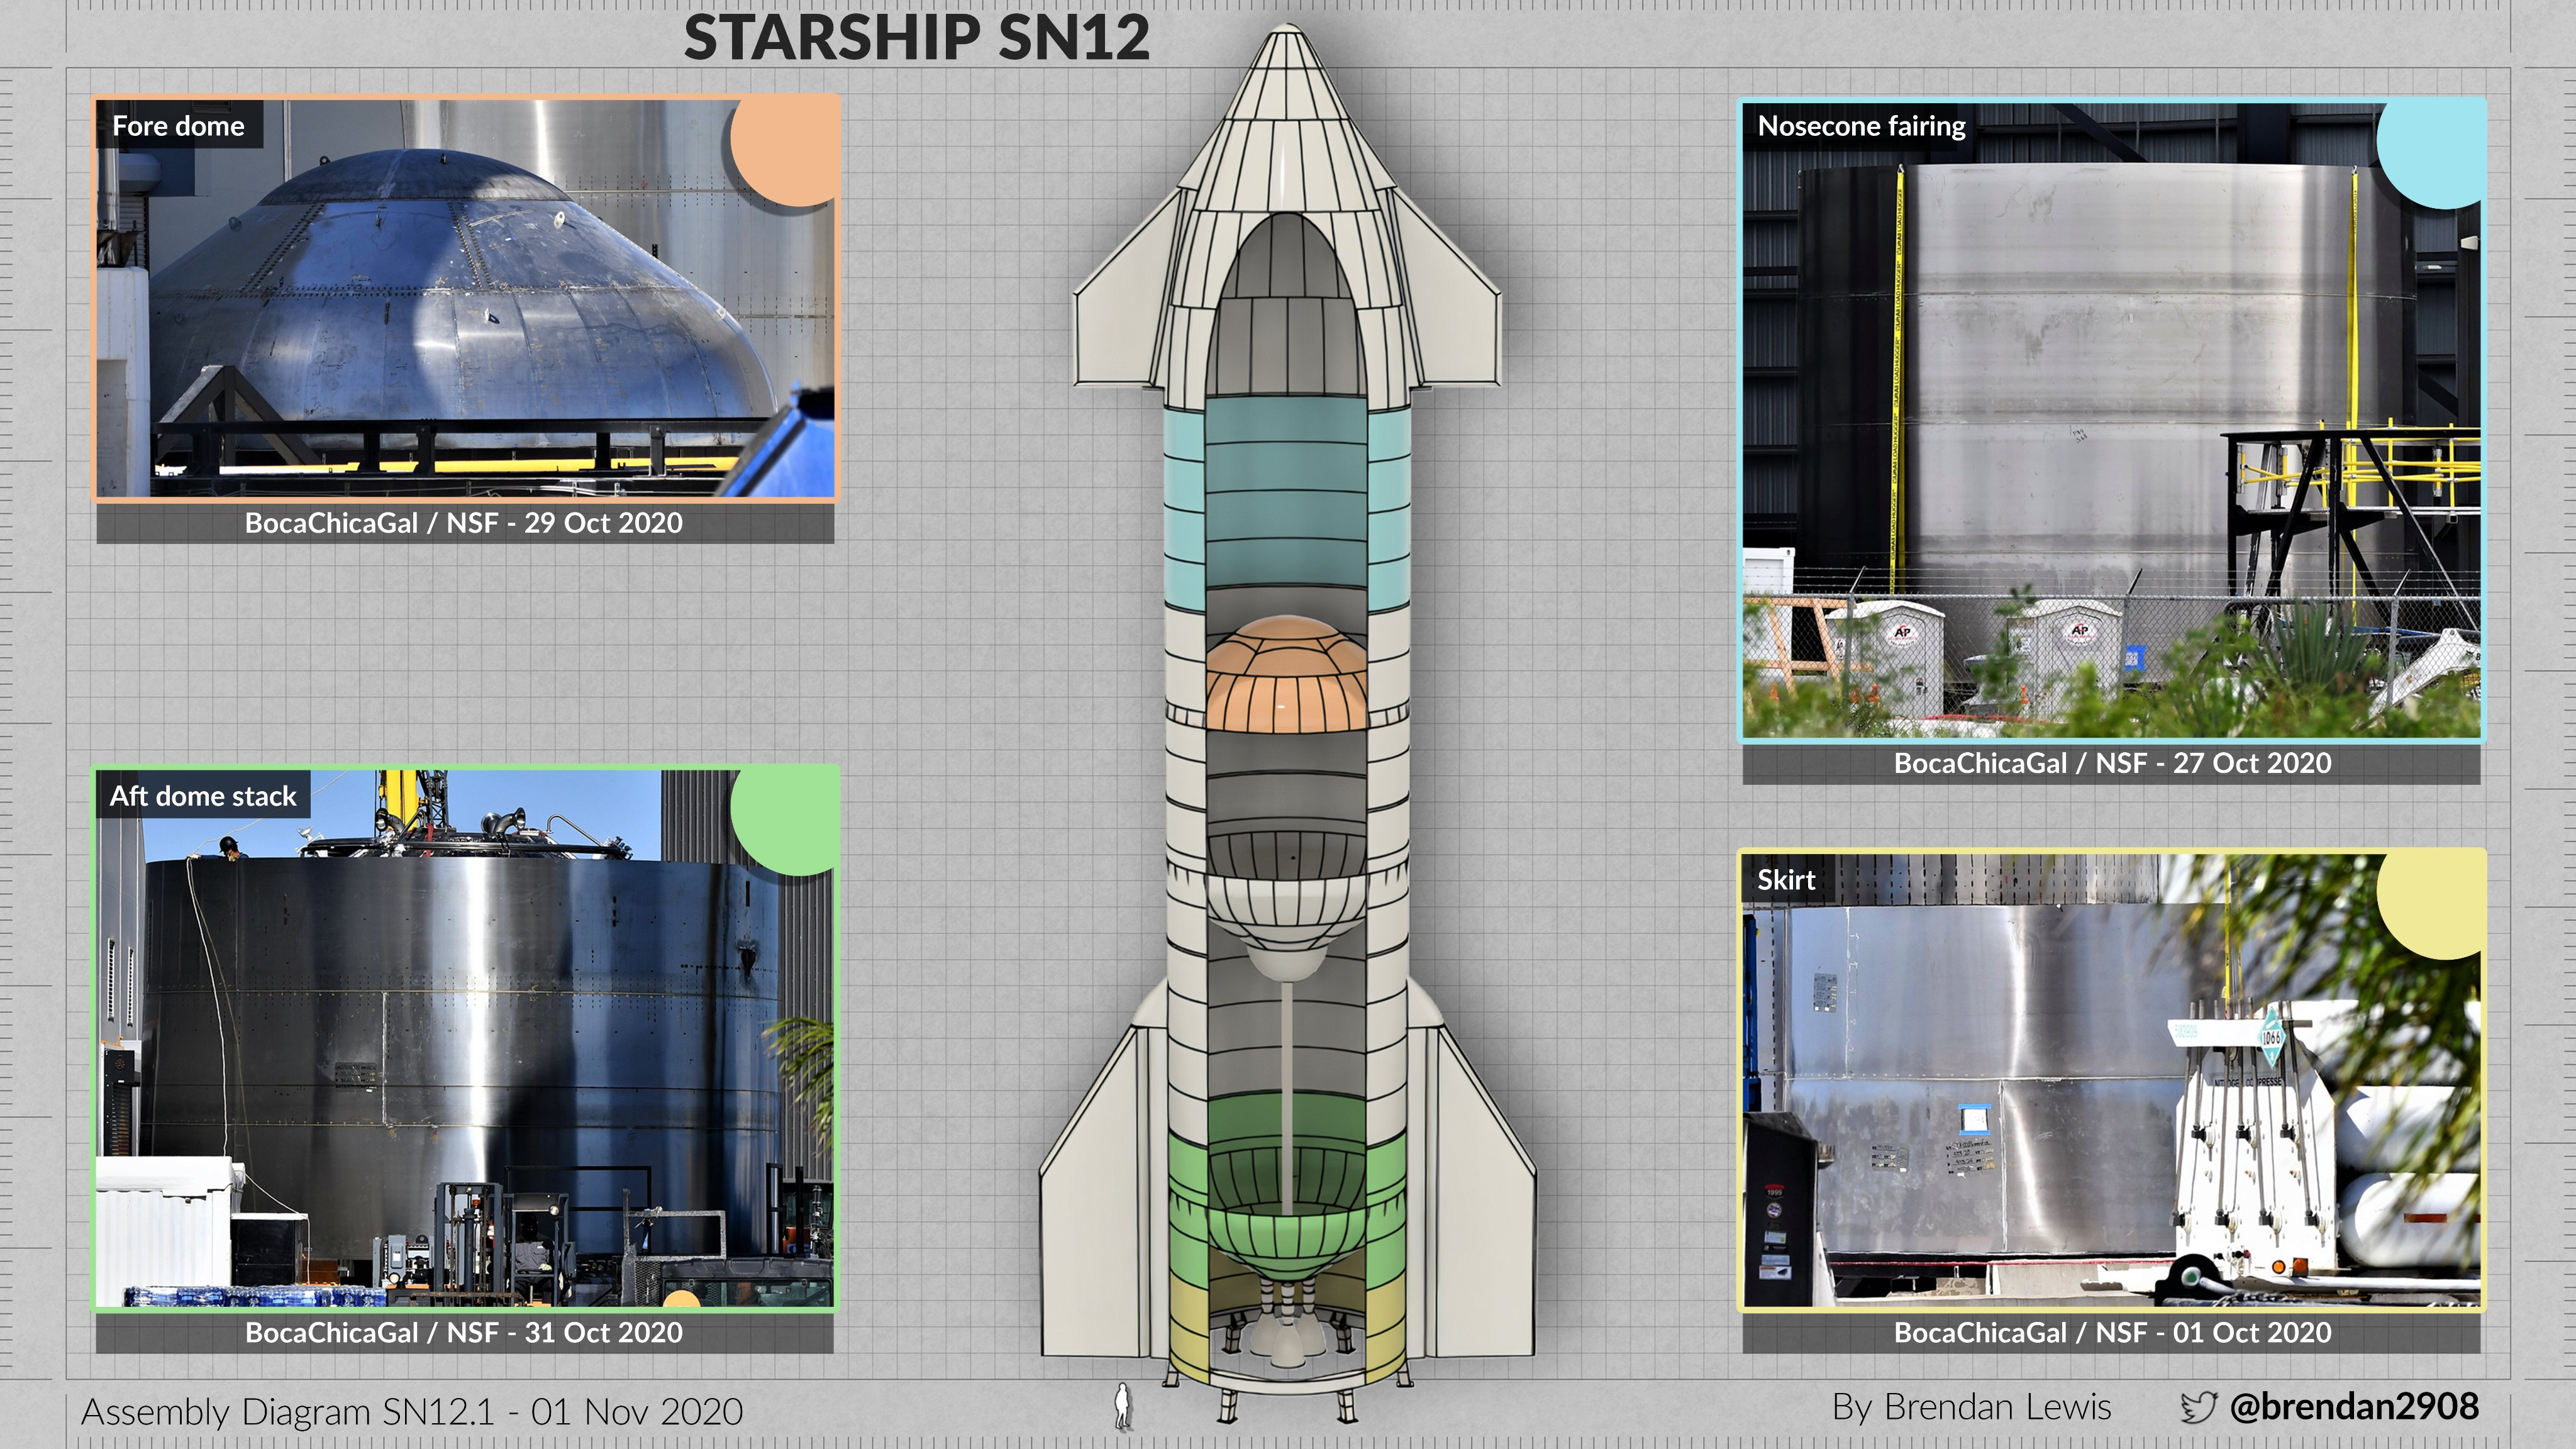 Starship SN12 (Boca Chica) ElvIV3yU4AADniJ?format=jpg&name=4096x4096